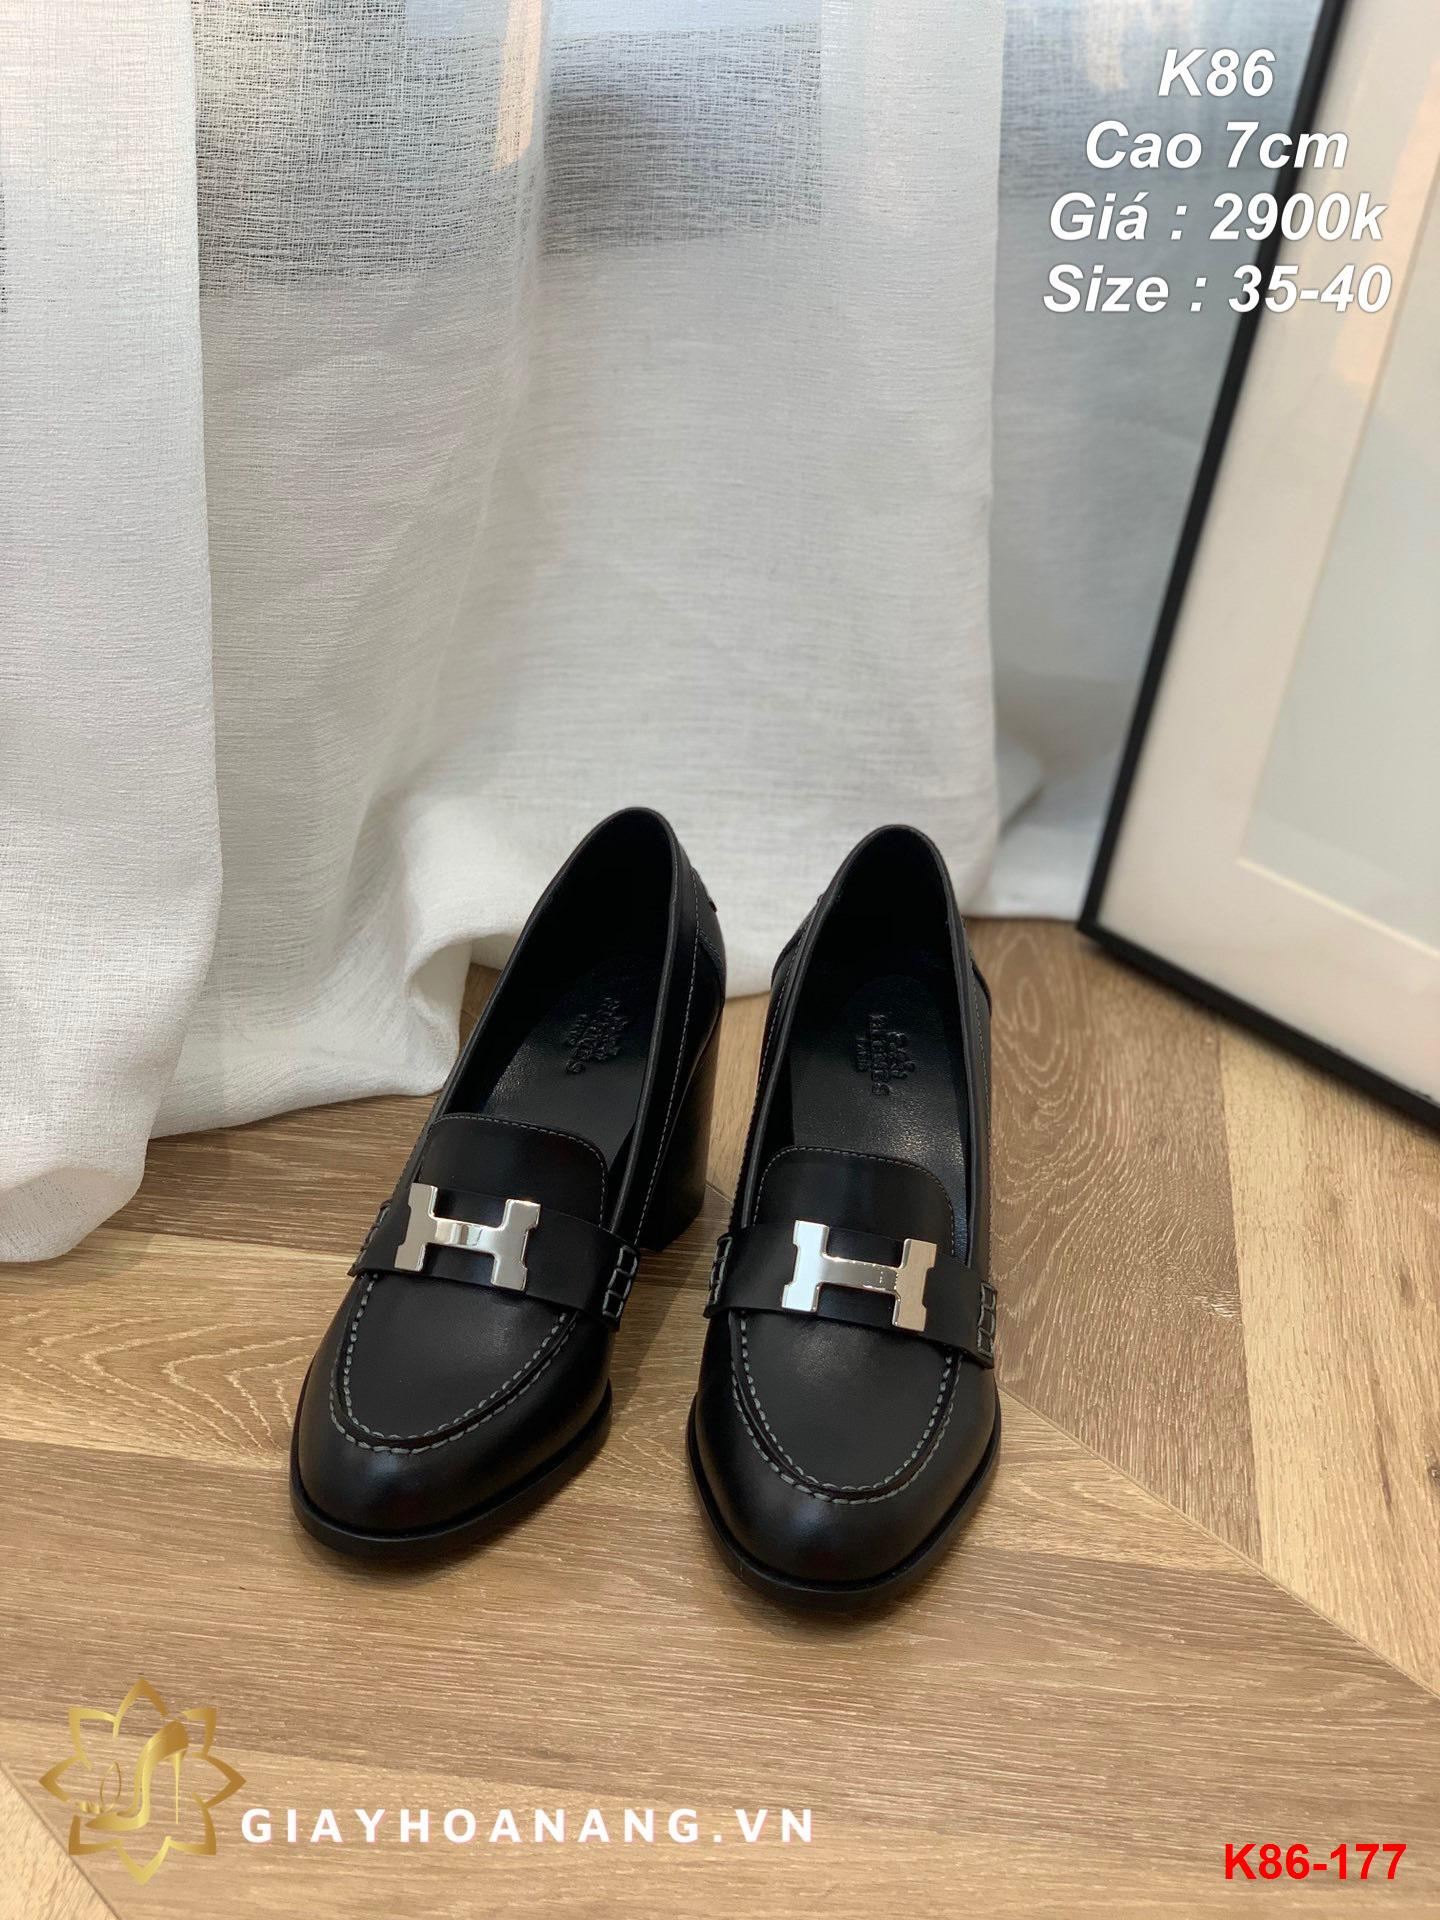 K86-177 Hermes giày cao 7cm siêu cấp